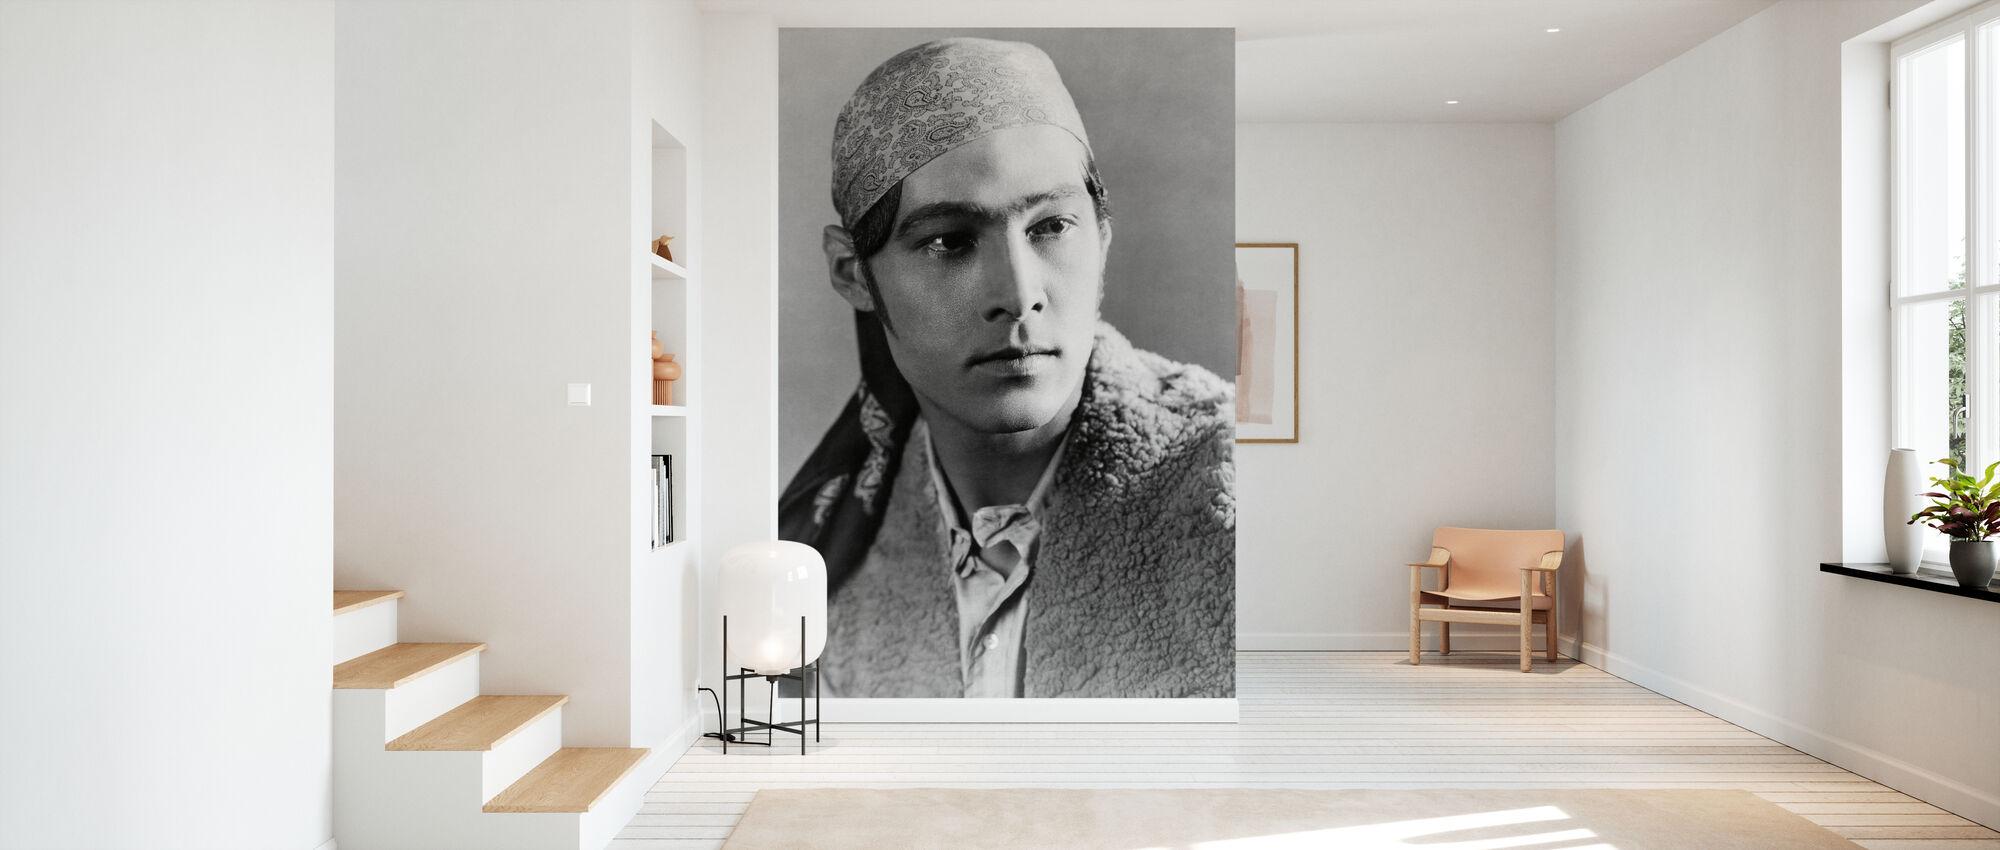 Blood and Sand - Rudolph Valentino - Wallpaper - Hallway